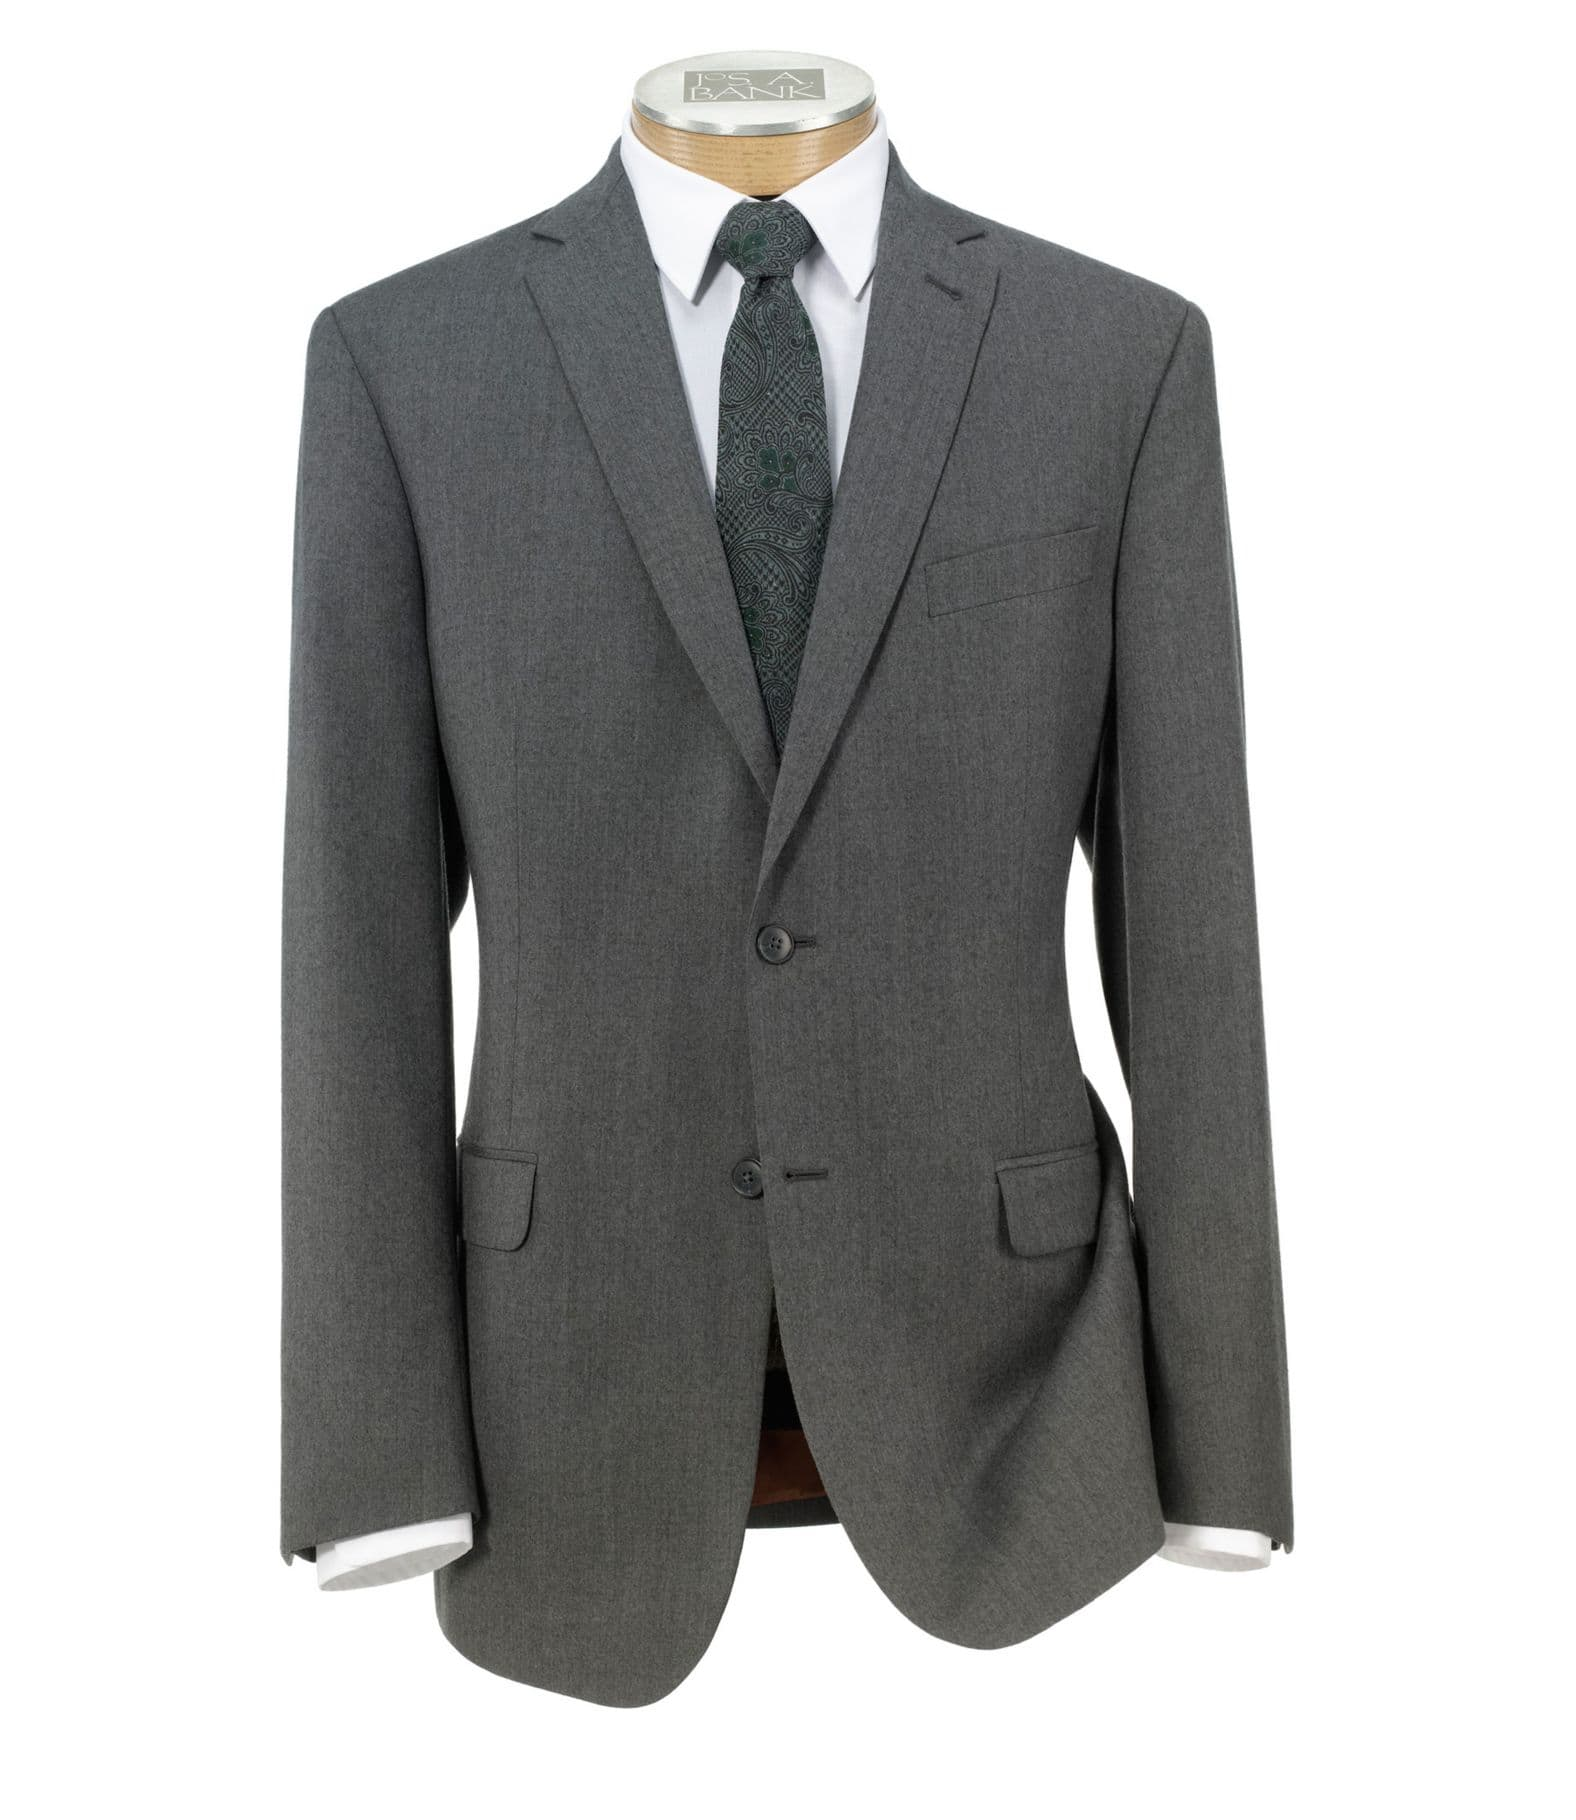 Joseph Slim Fit 2-Button Wool/Cashmere Suit (various colors)  $69 + Free Shipping